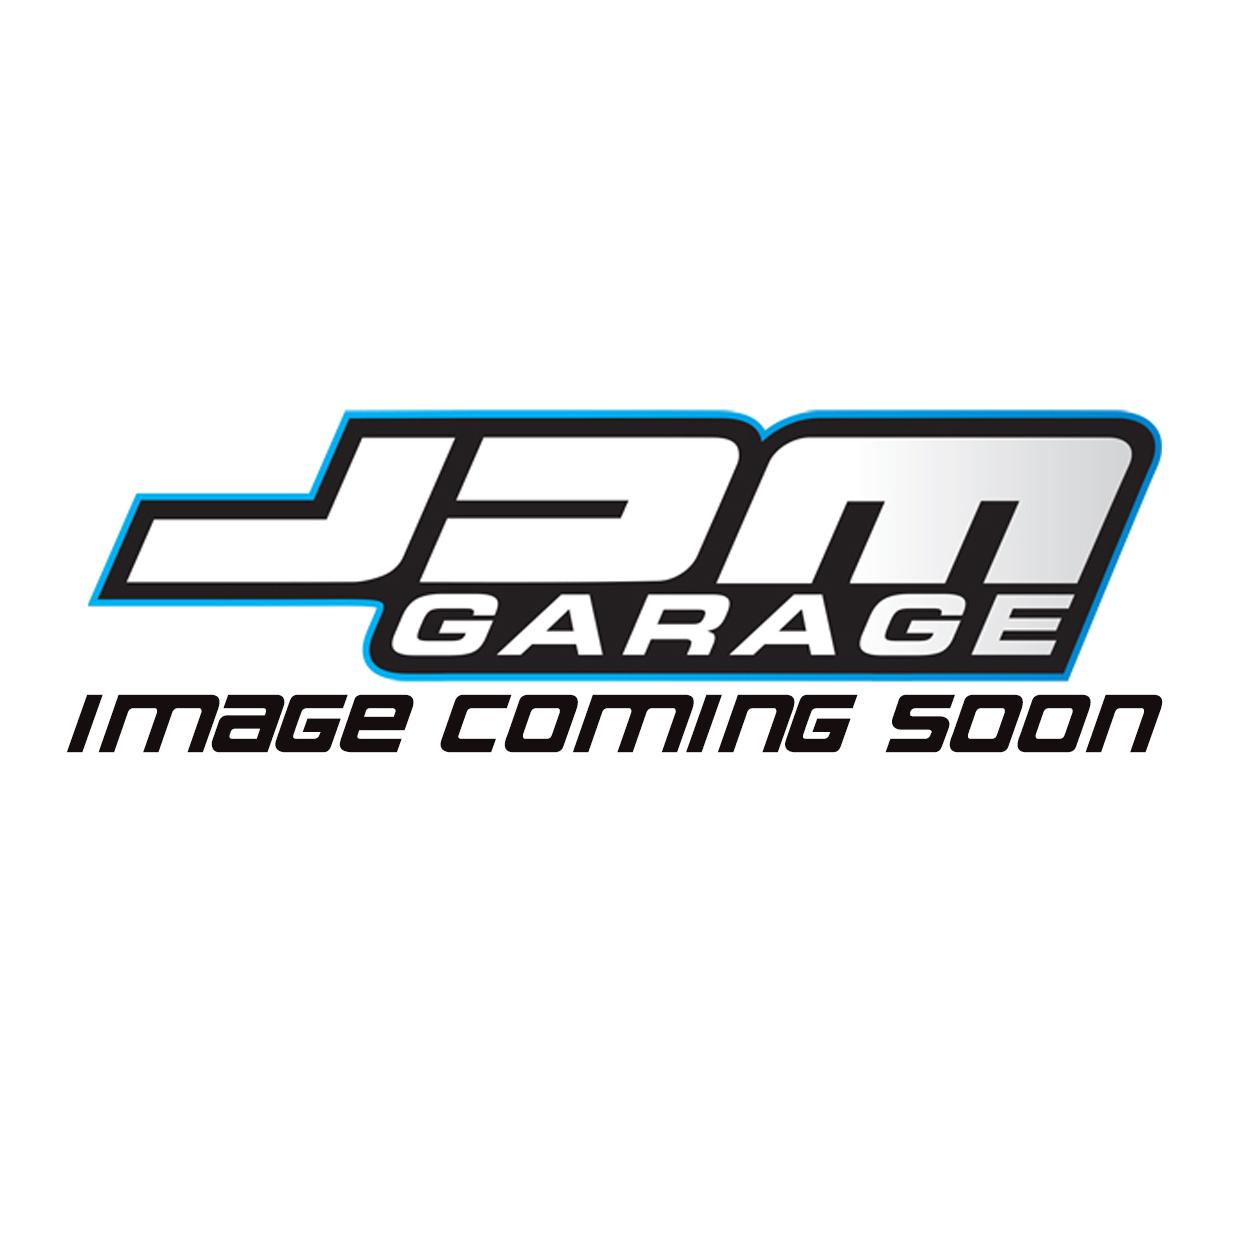 Ross Sport Crank Angle Sensor Mount Nissan Silvia S13 180SX / S14 200SX / S15 SR20DET